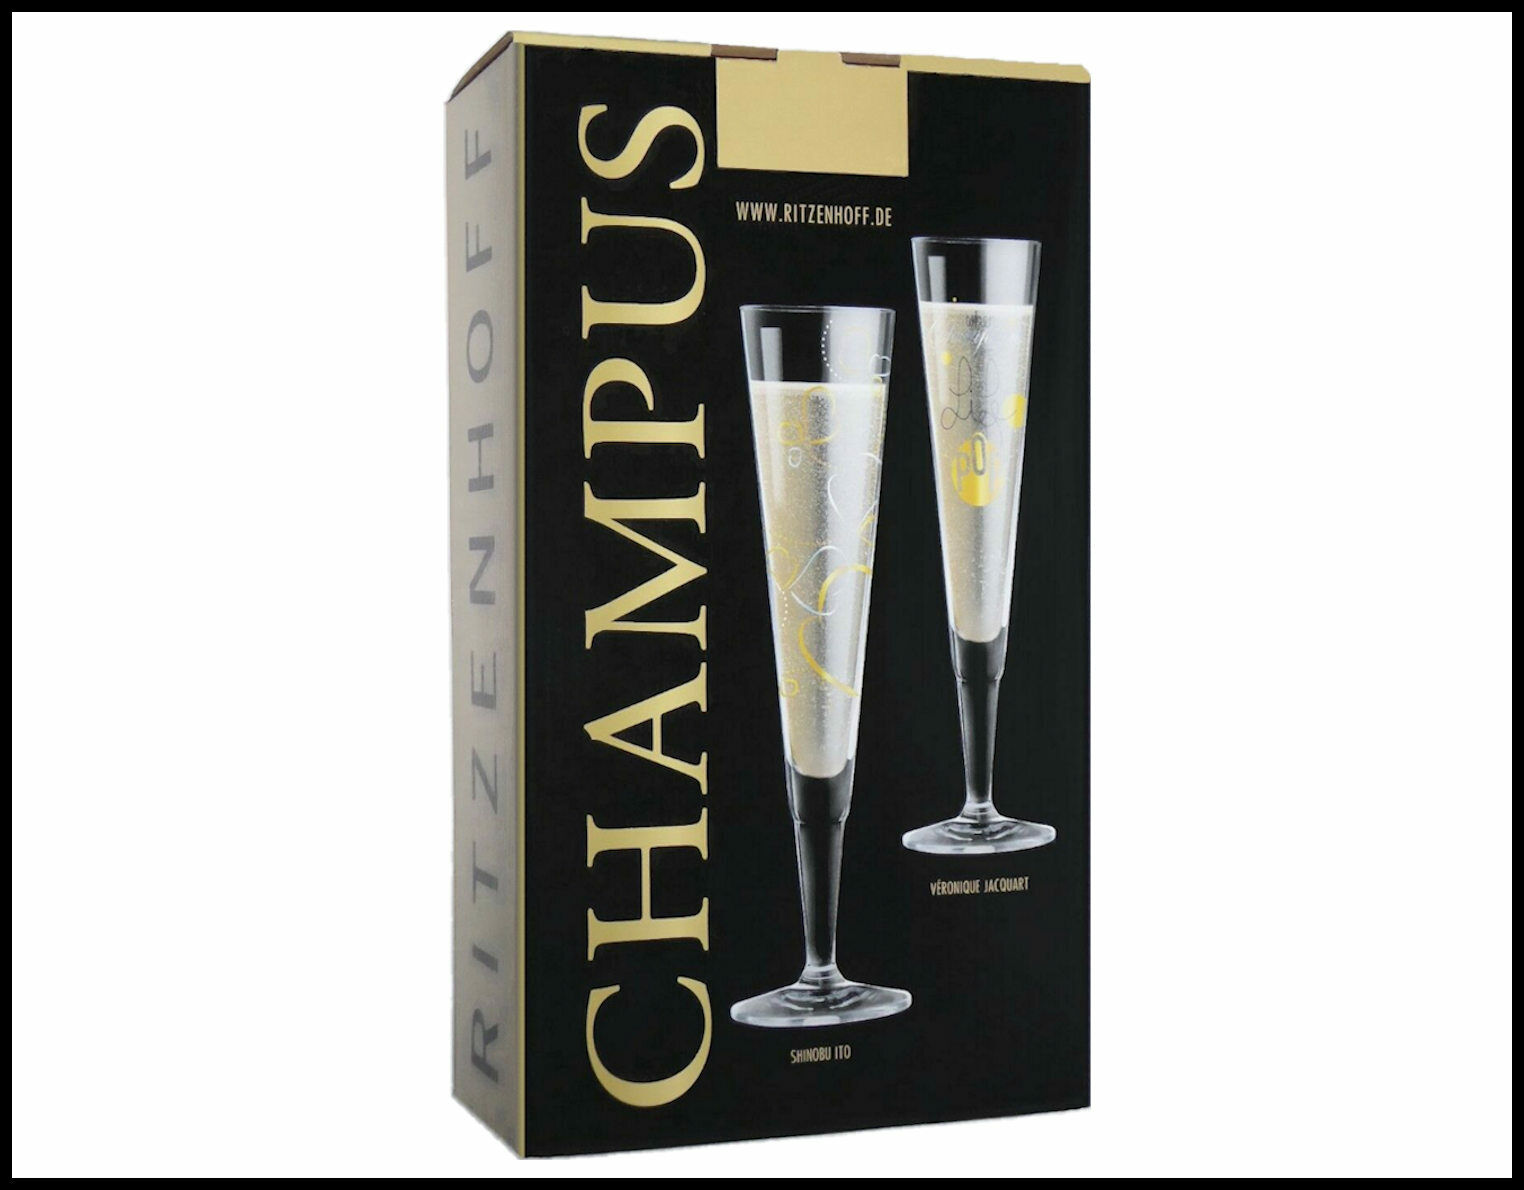 Champagnerflöte 0,2l Iris Interthal 2017 Ritzenhoff CHAMPUS Champa Sektflöte